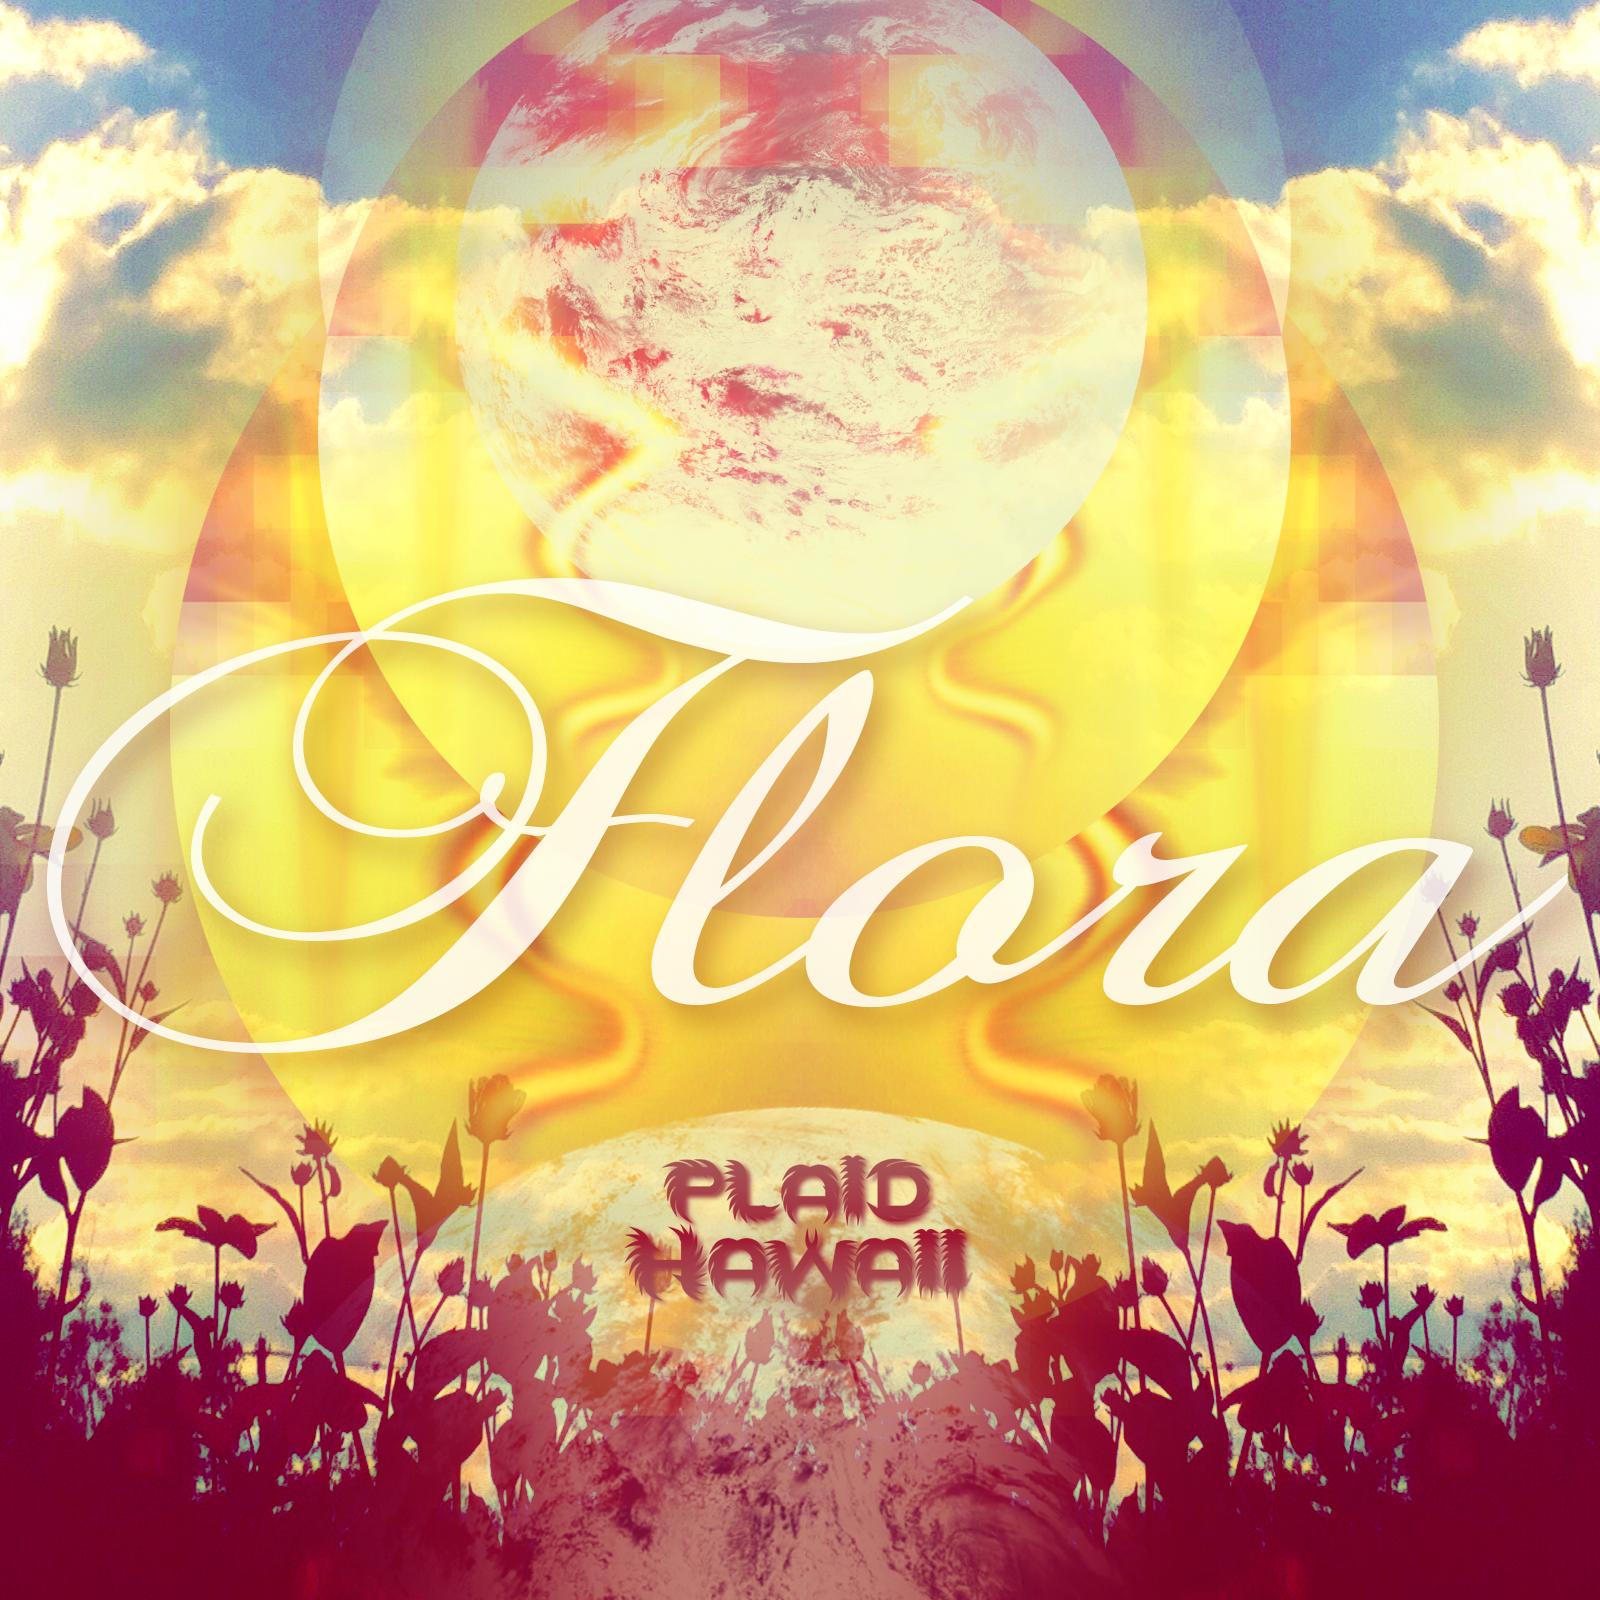 PlaidHawaii-Flora-04-FINAL.png